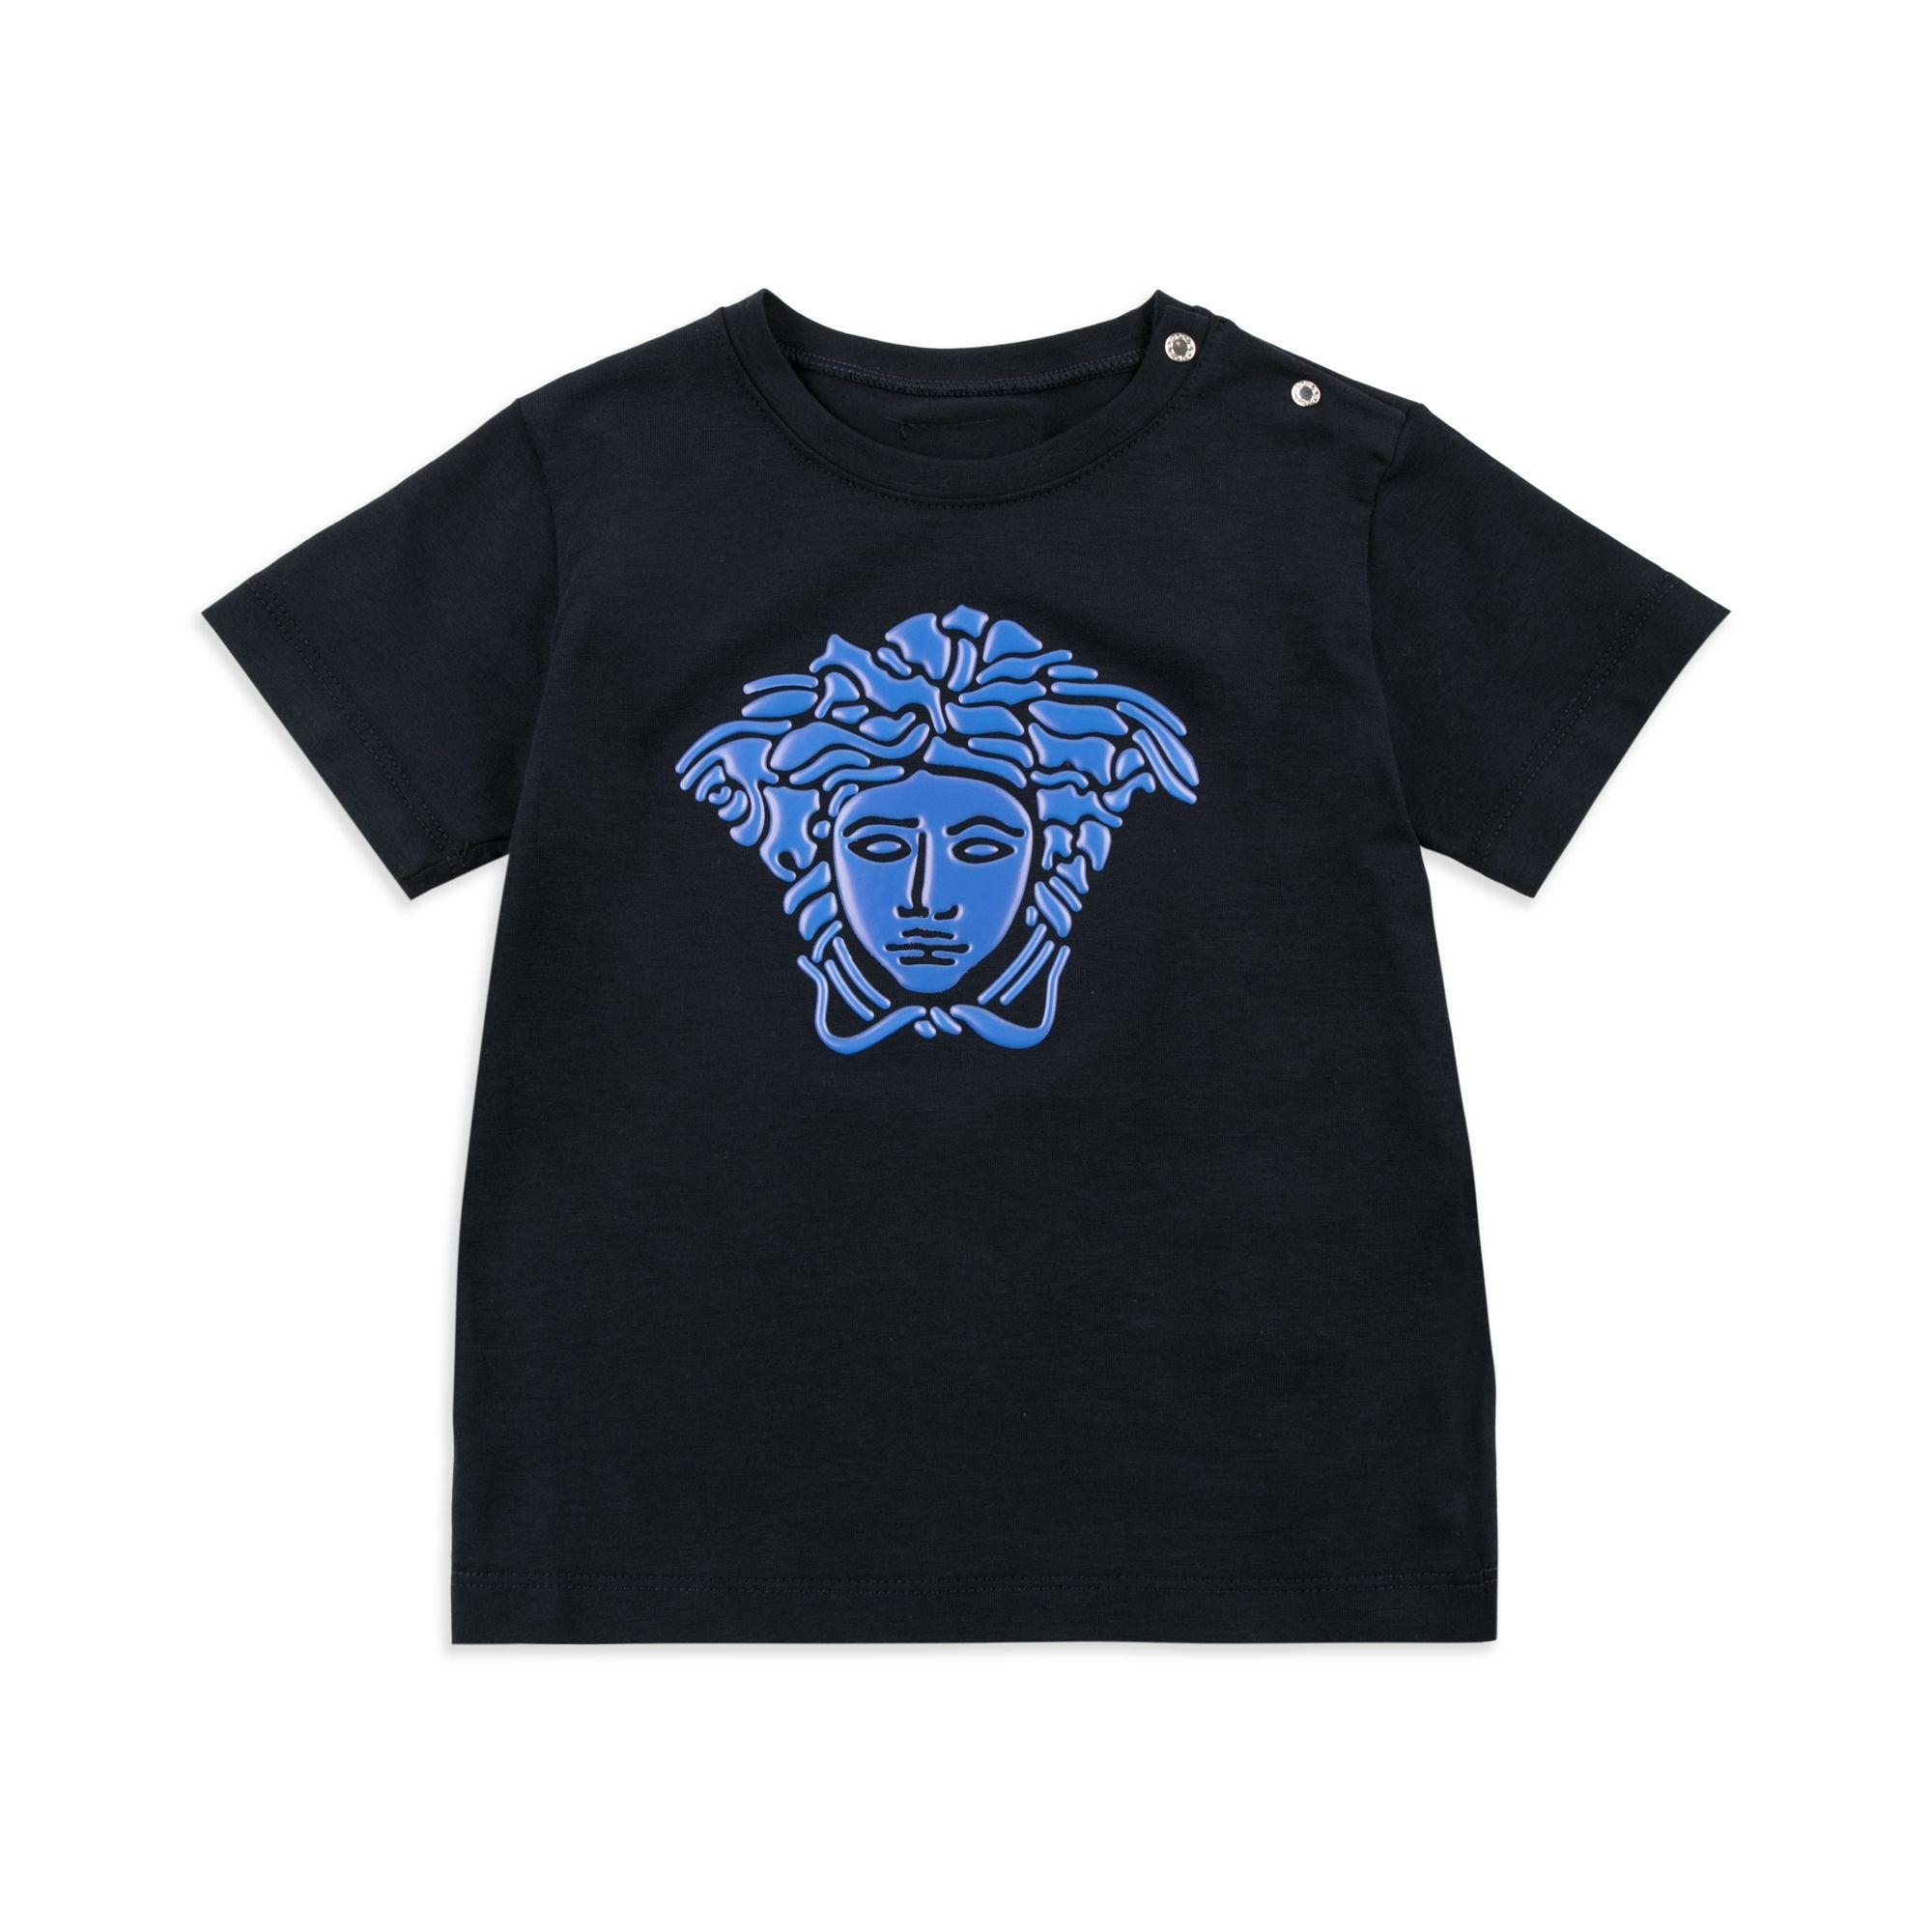 84f4f84a YOUNG VERSACE Baby Boys Iridescent Medusa Head T-Shirt - Navy Baby short  sleeve t-shirt • Soft stretchy cotton • Round neckline • Shoulder popper  fastening ...